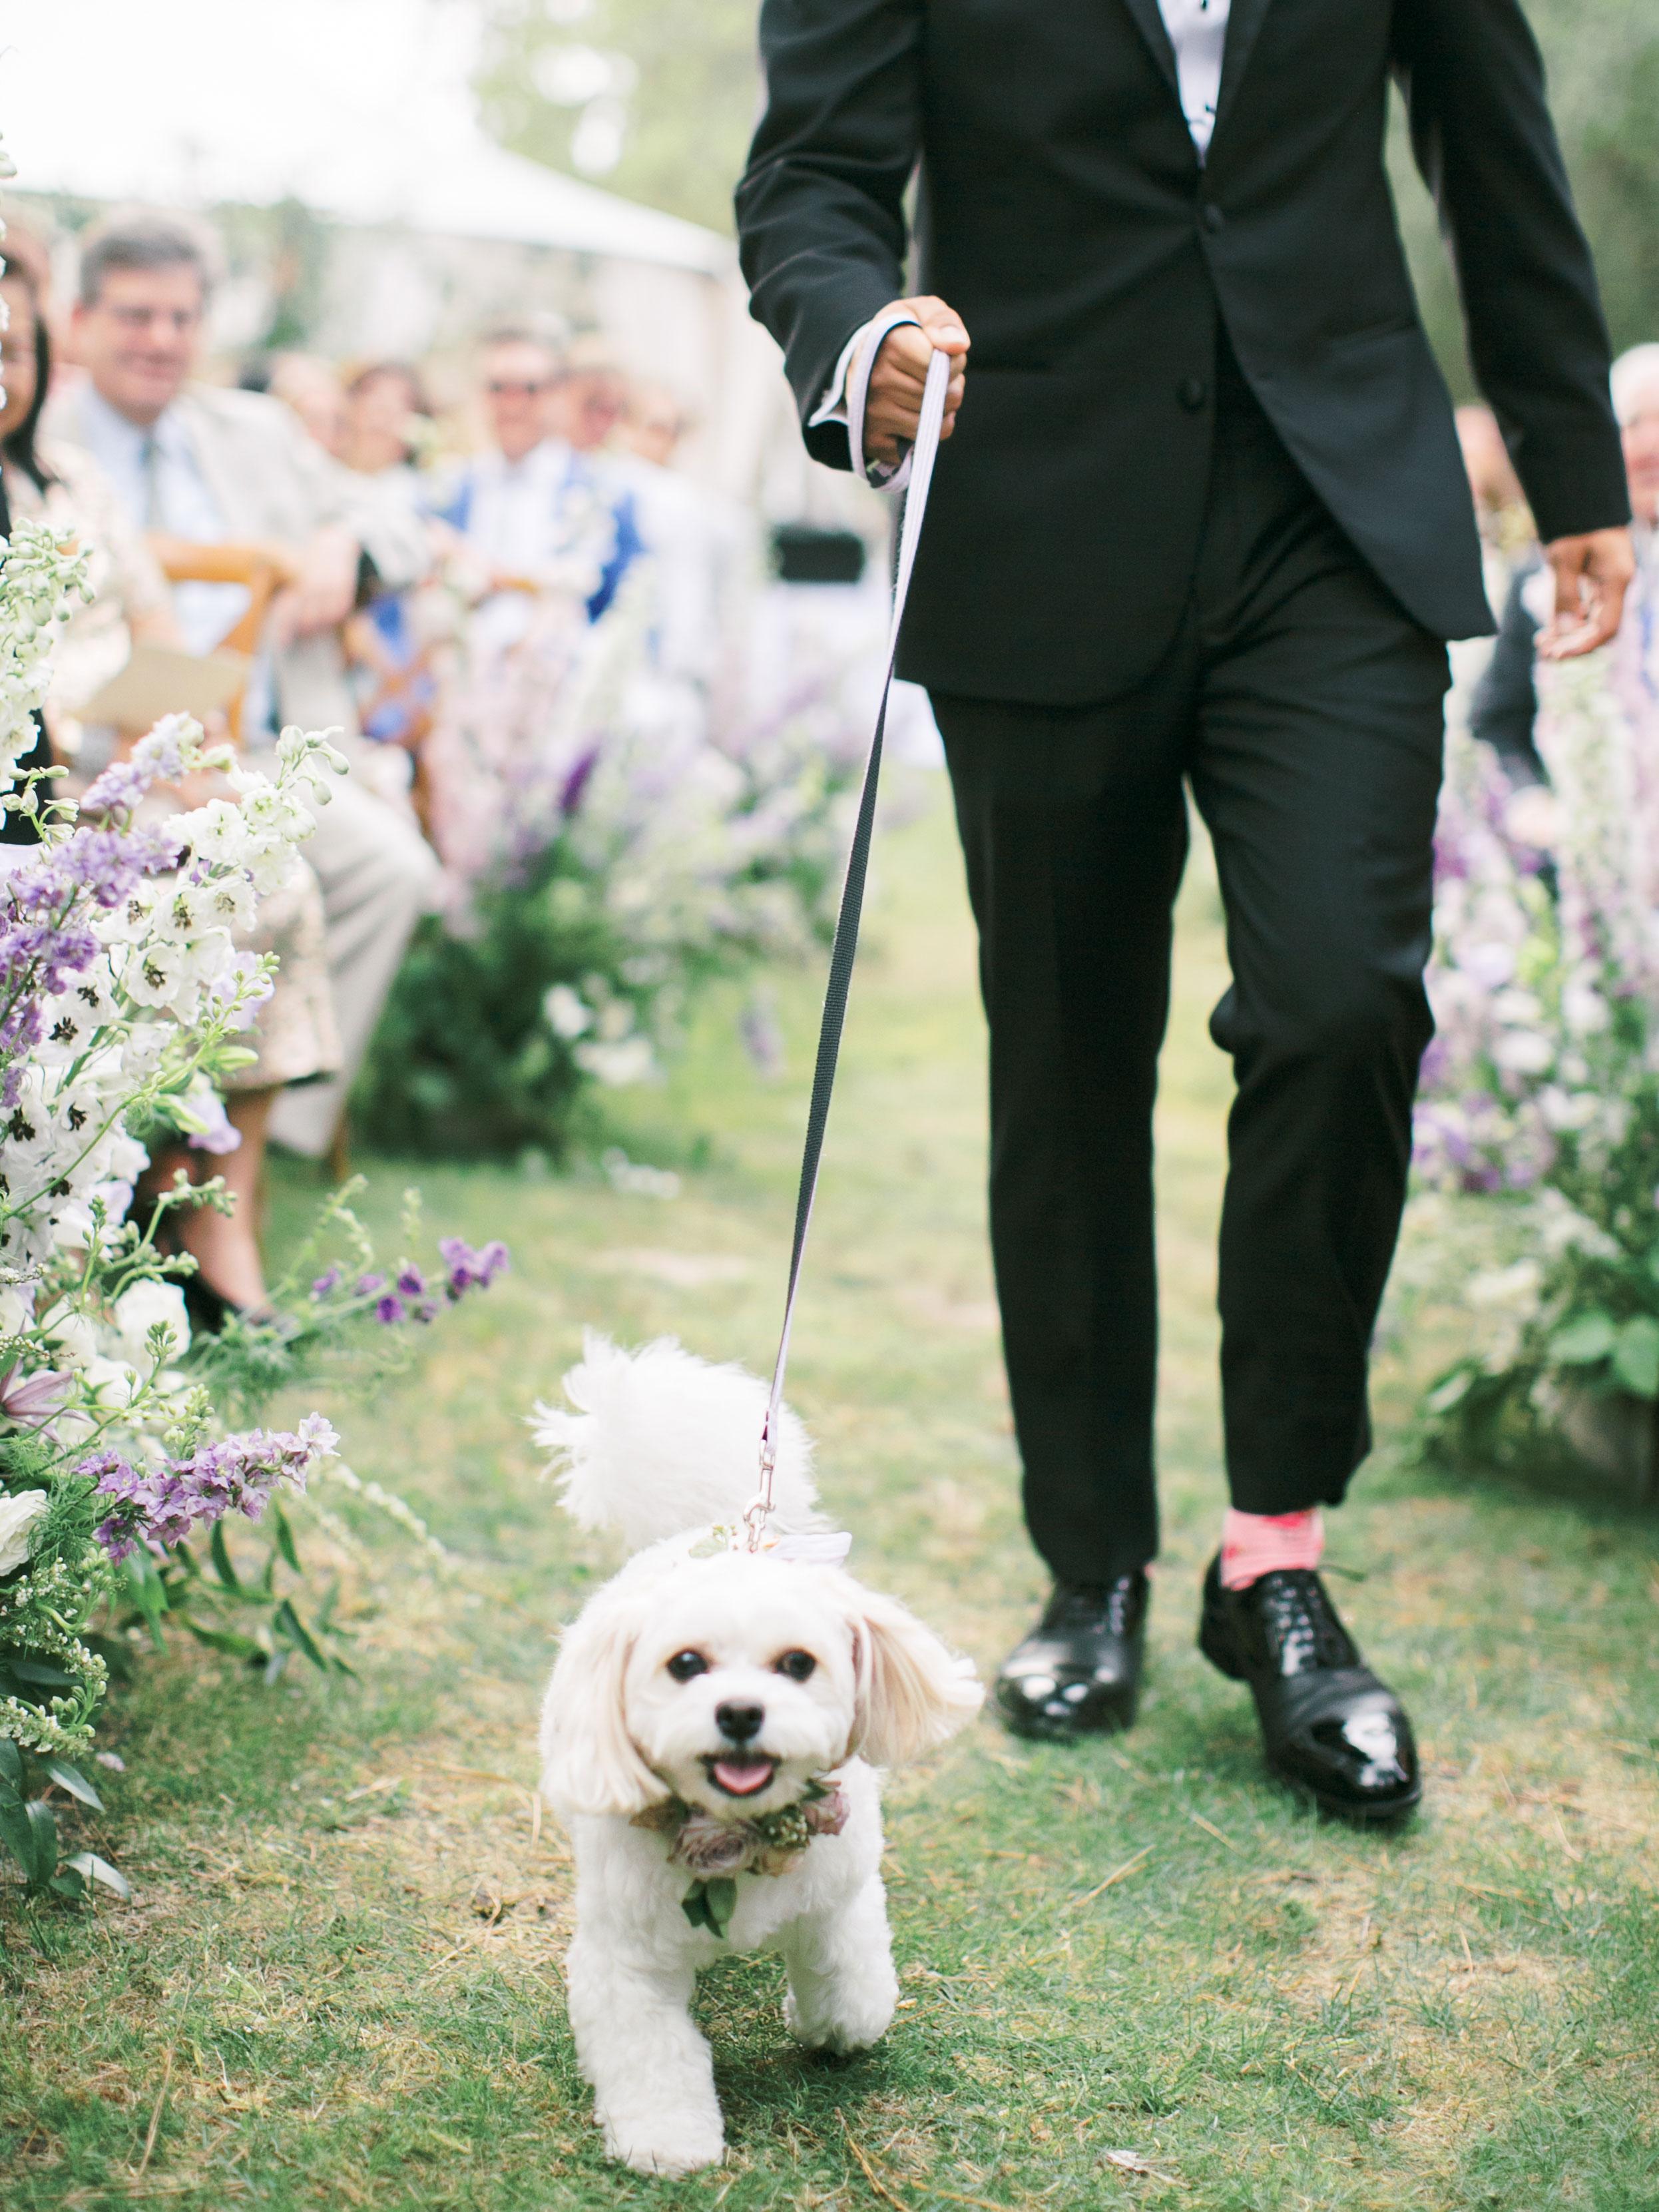 leighton craig wedding dog on leash